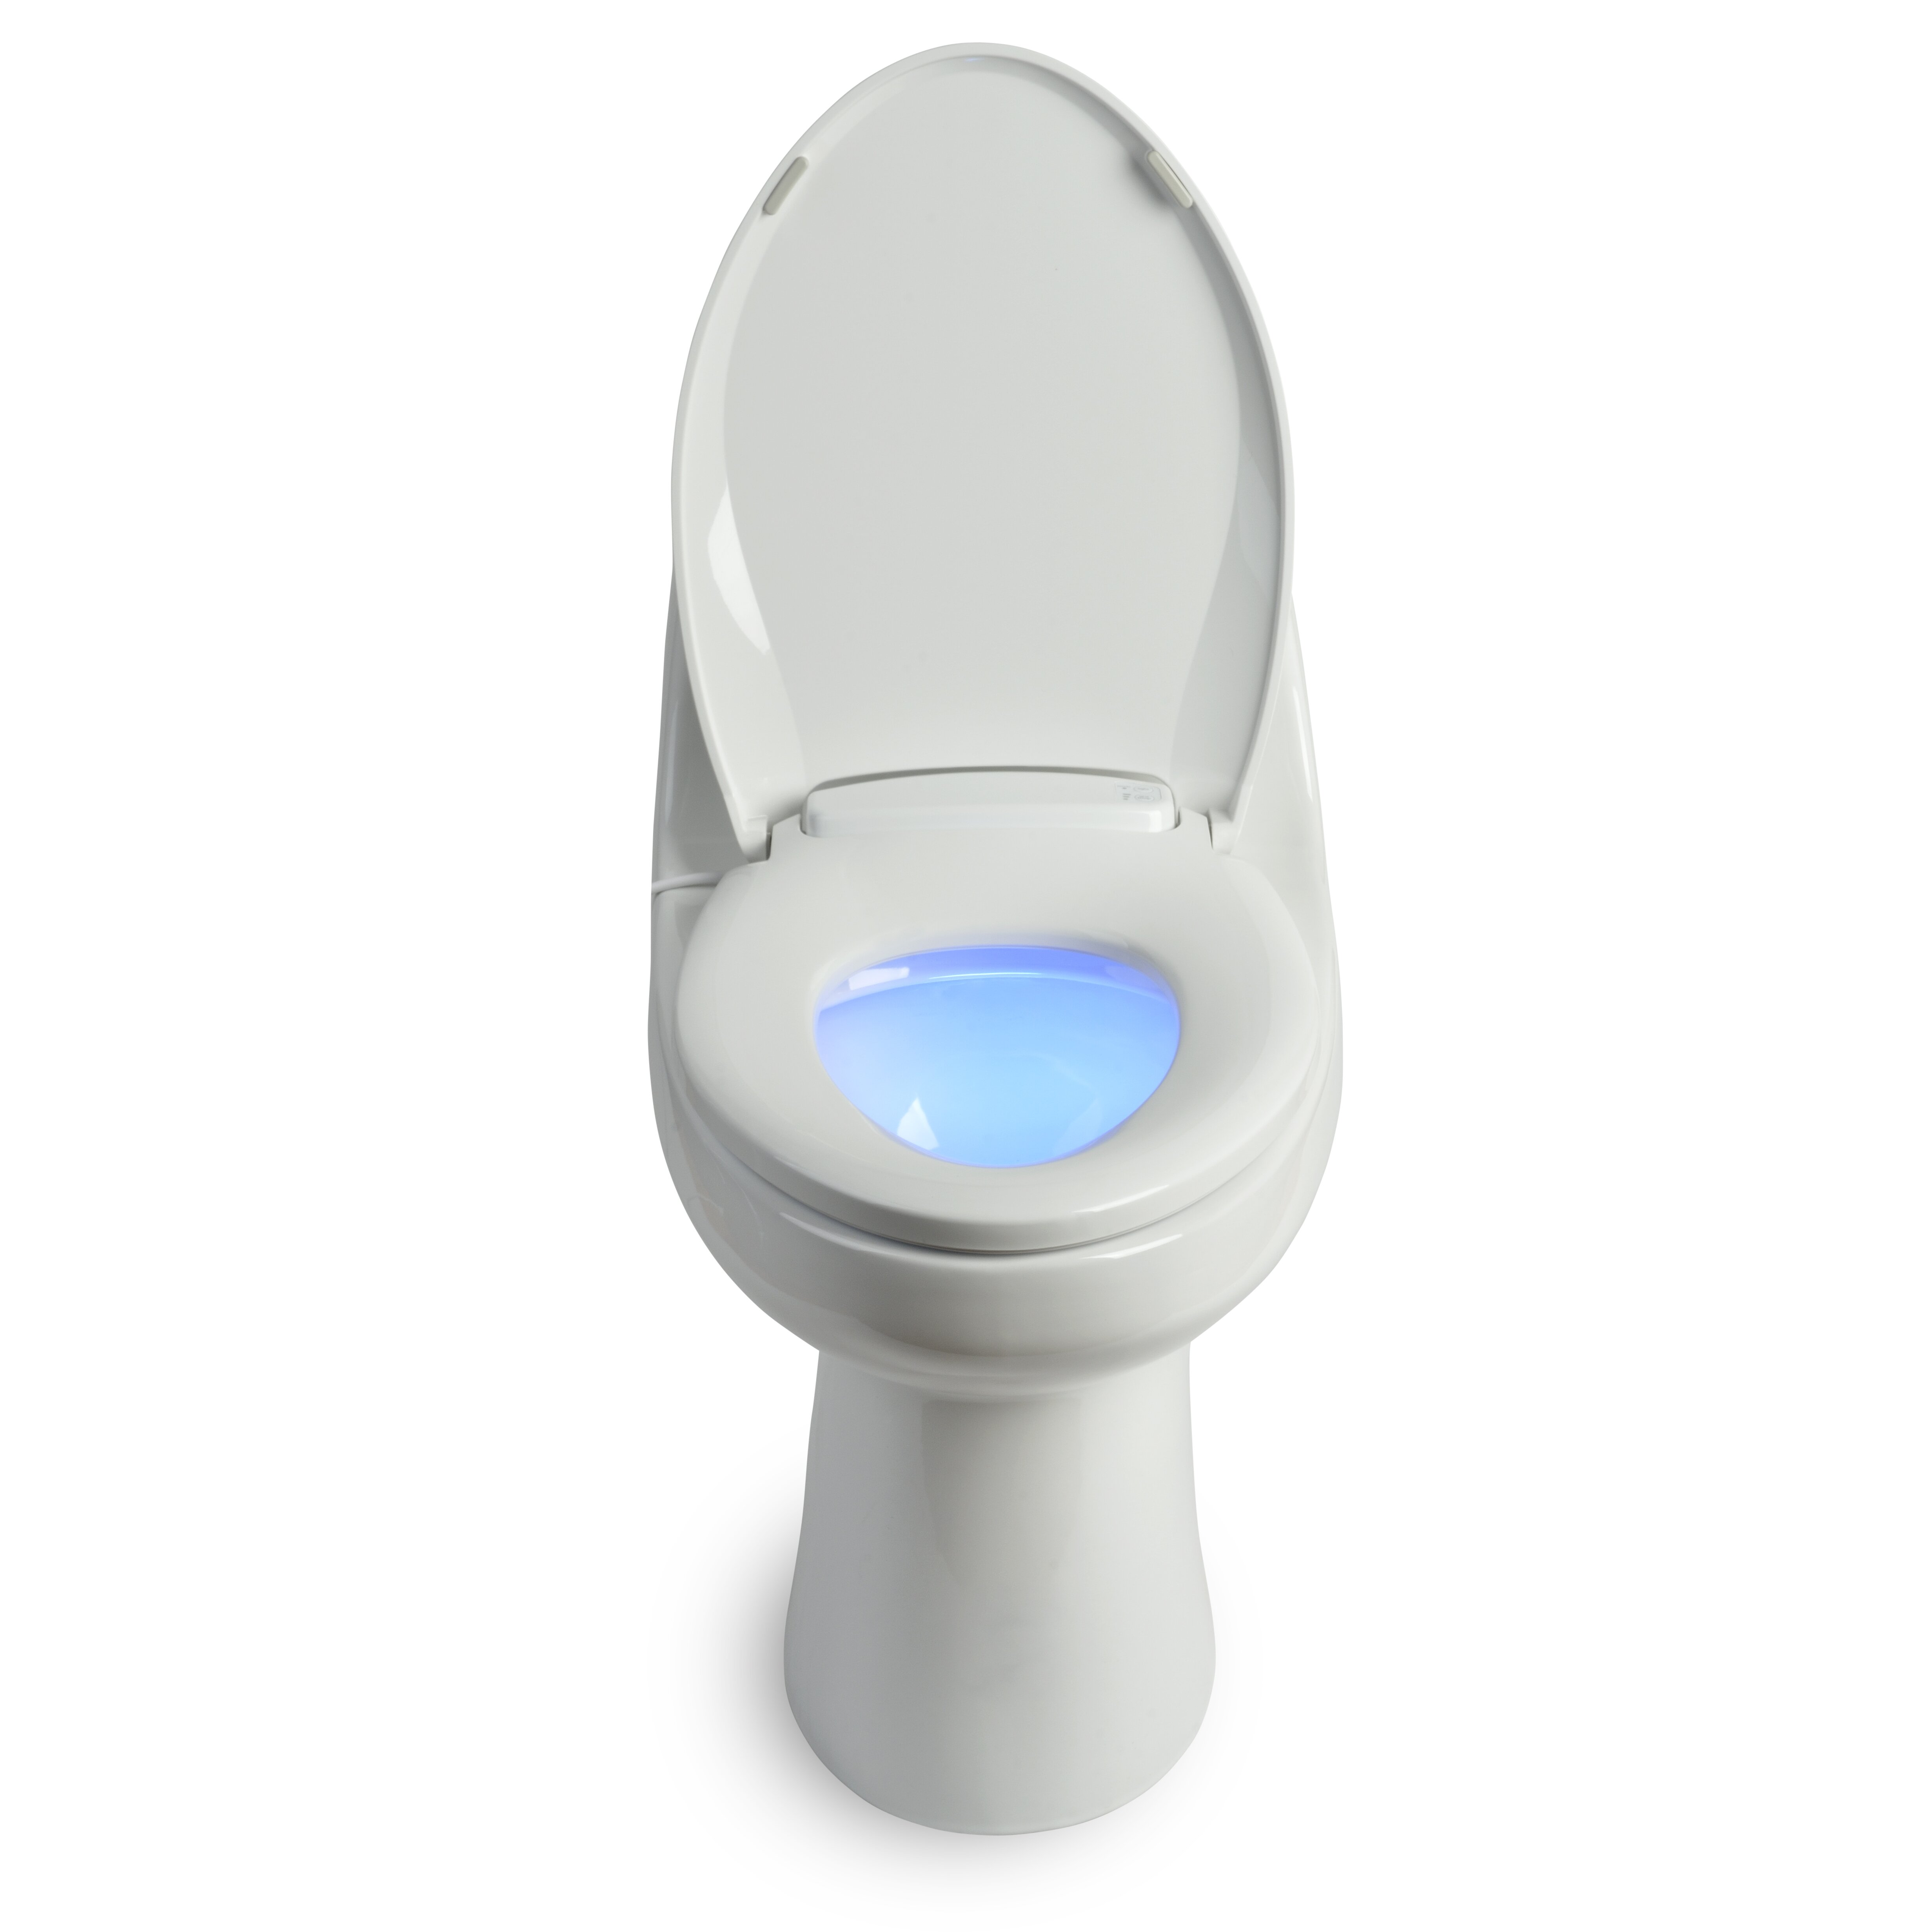 brondell lumawarm heated nightlight toilet seat reviews wayfair